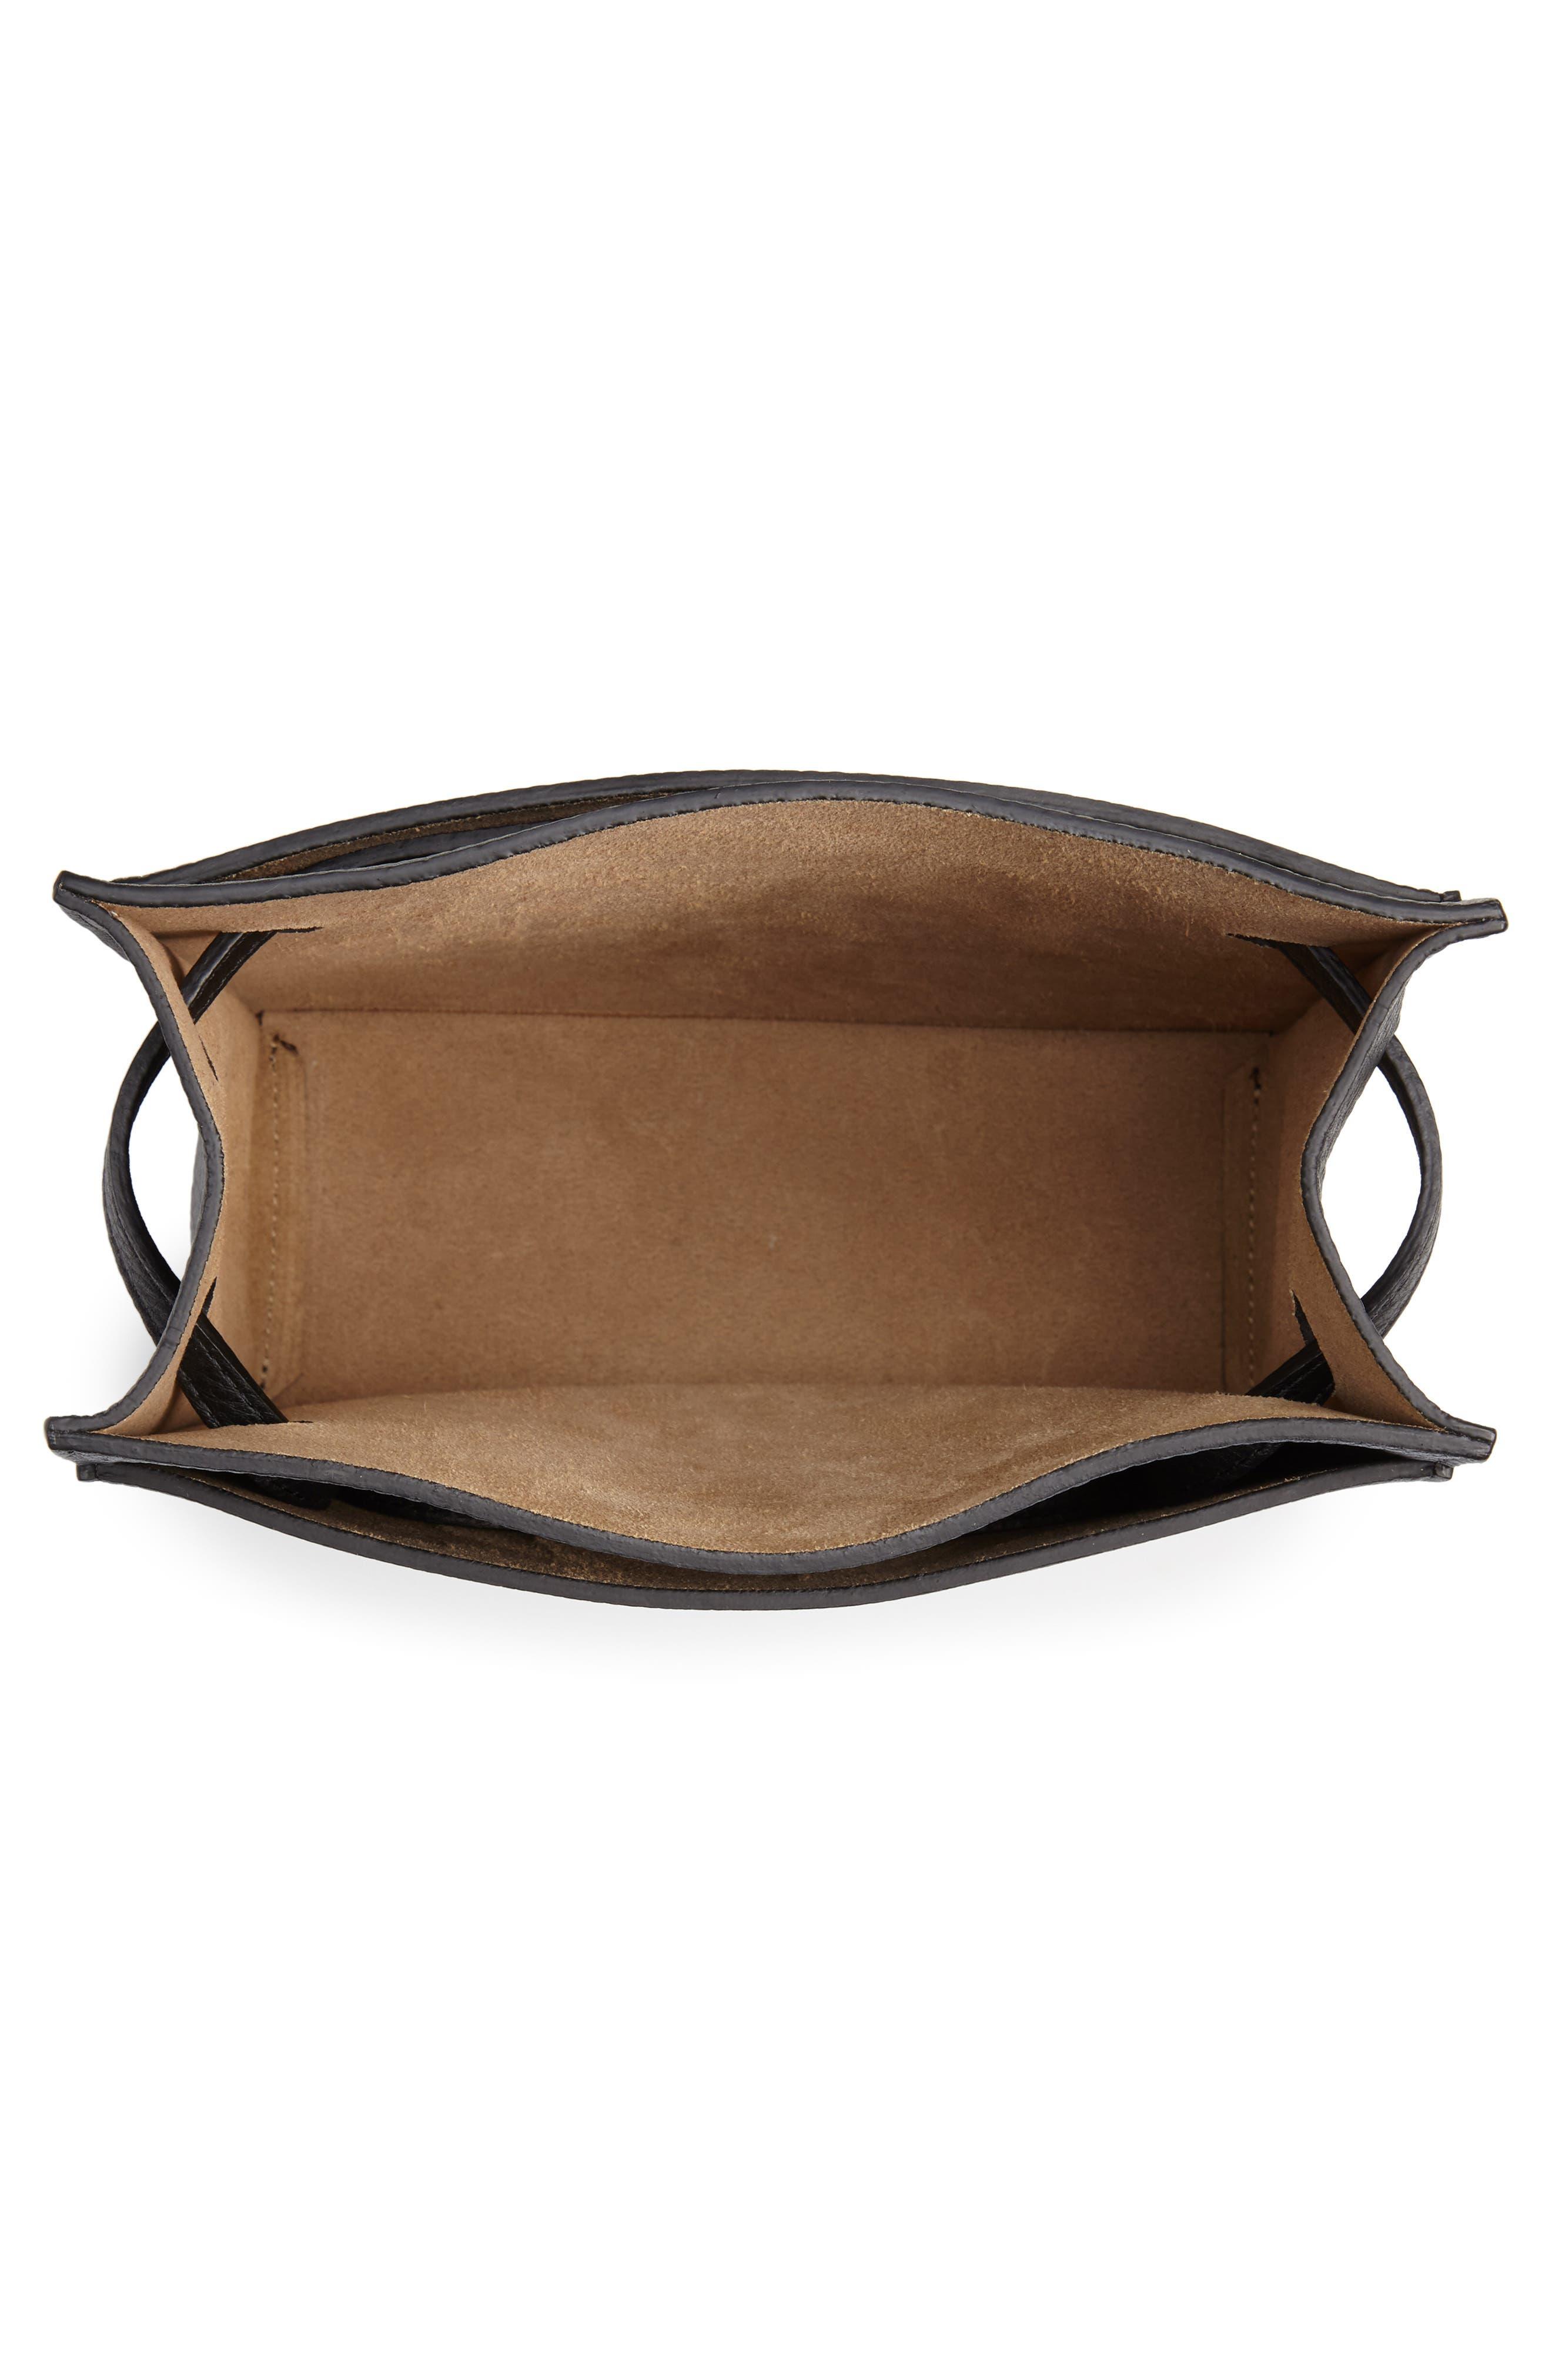 Kit Leather Convertible Shoulder Bag,                             Alternate thumbnail 5, color,                             TRUE BLACK